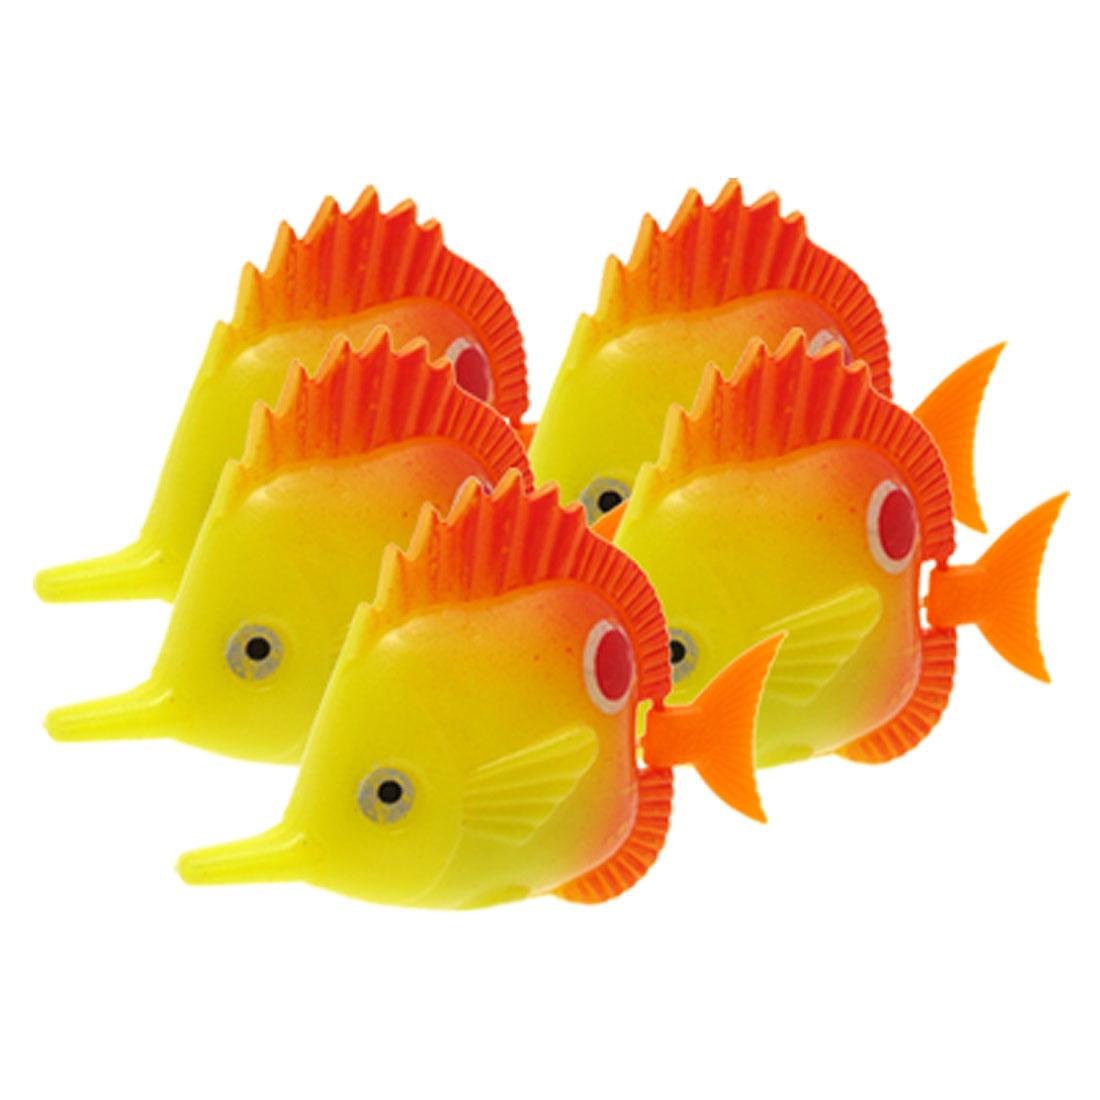 Stylish Yellow Plastic Floating Fish Ornament for Aquarium